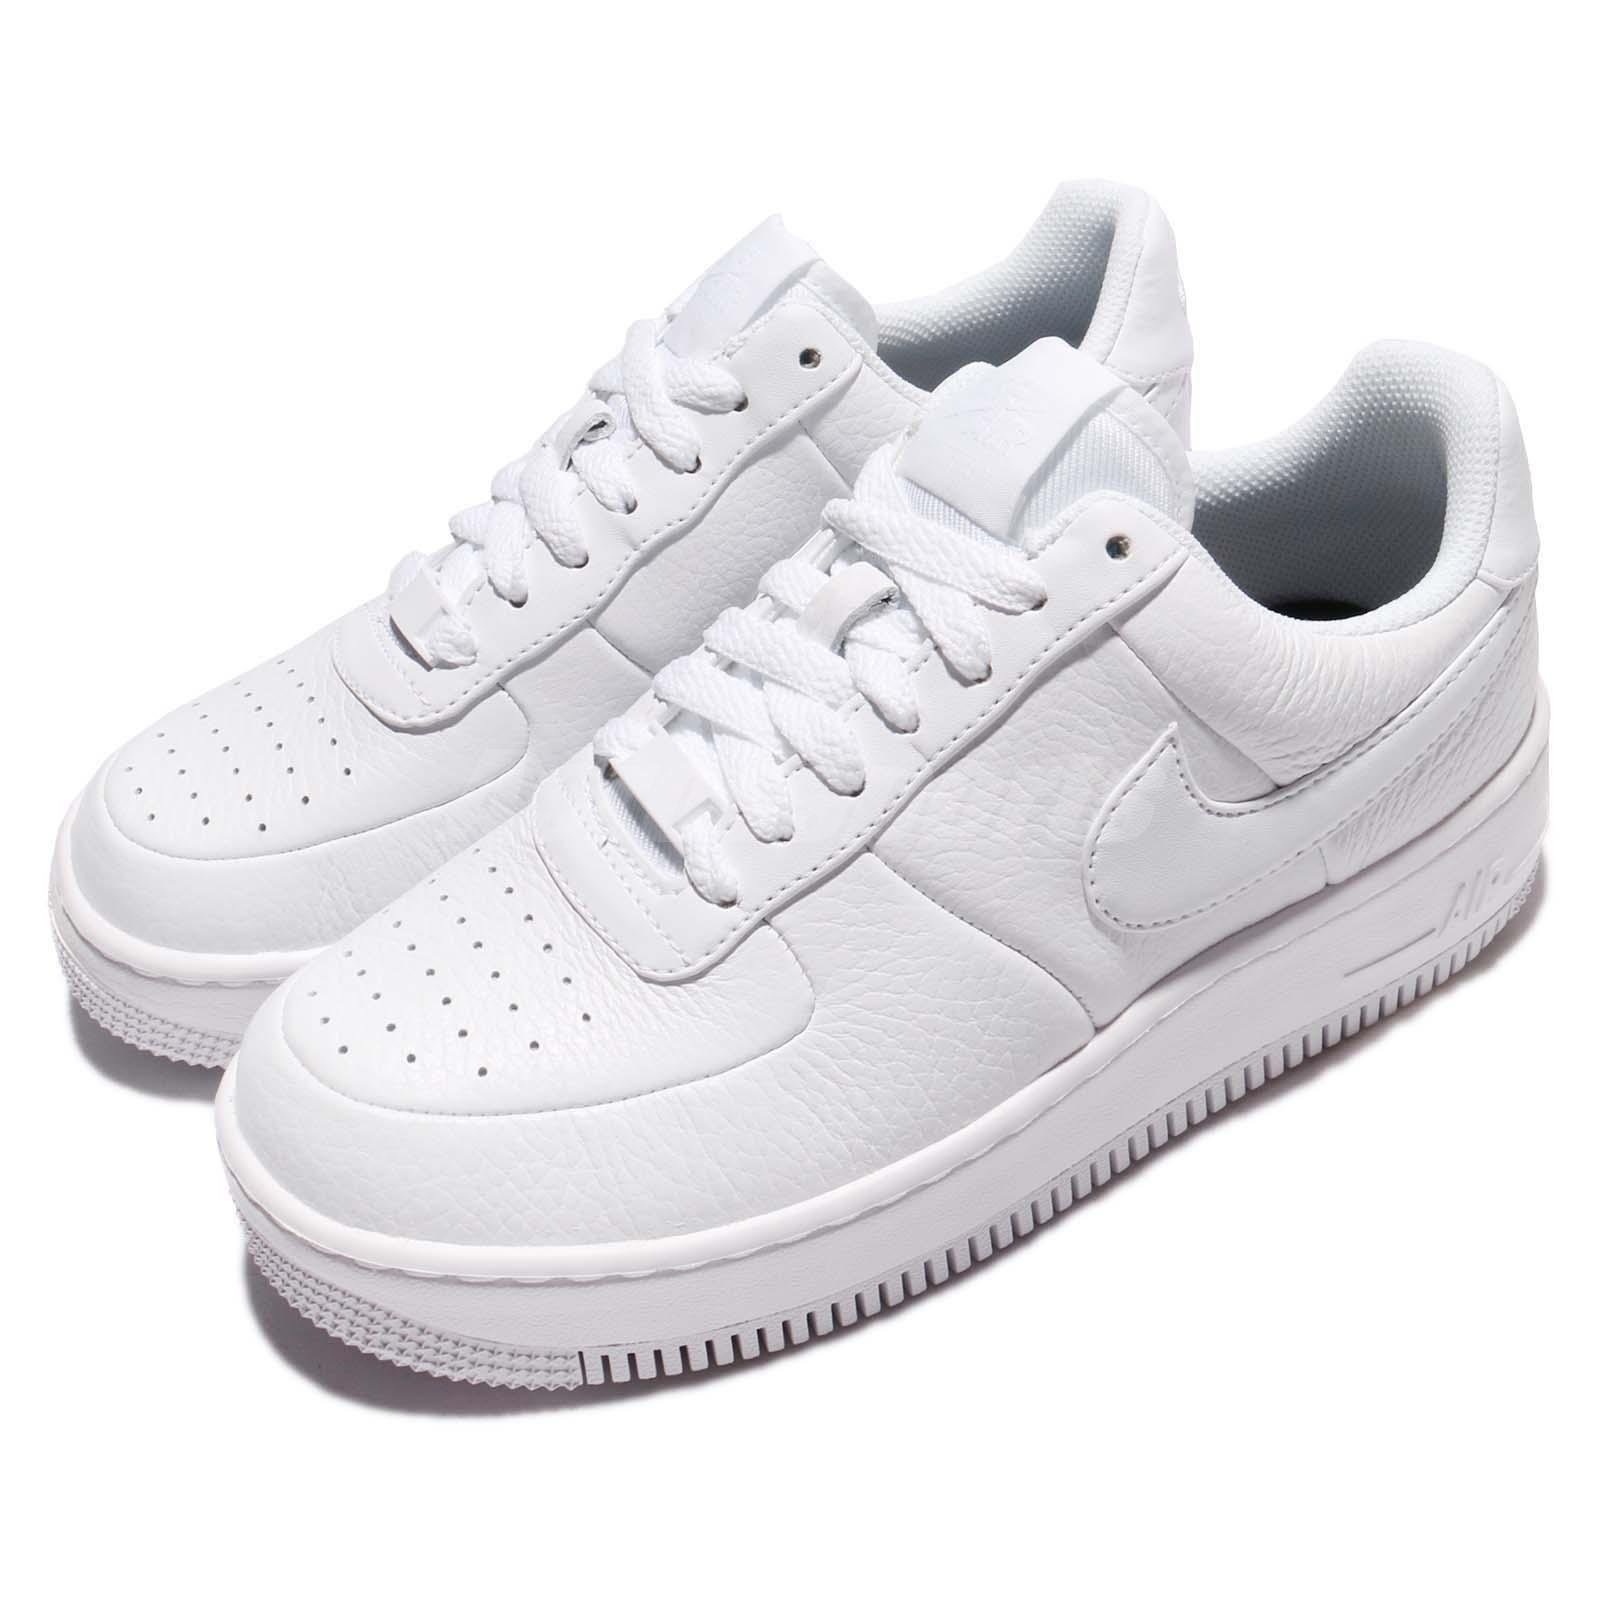 119.99   Wmns Nike AF1 Upstep White Black Air Force 1